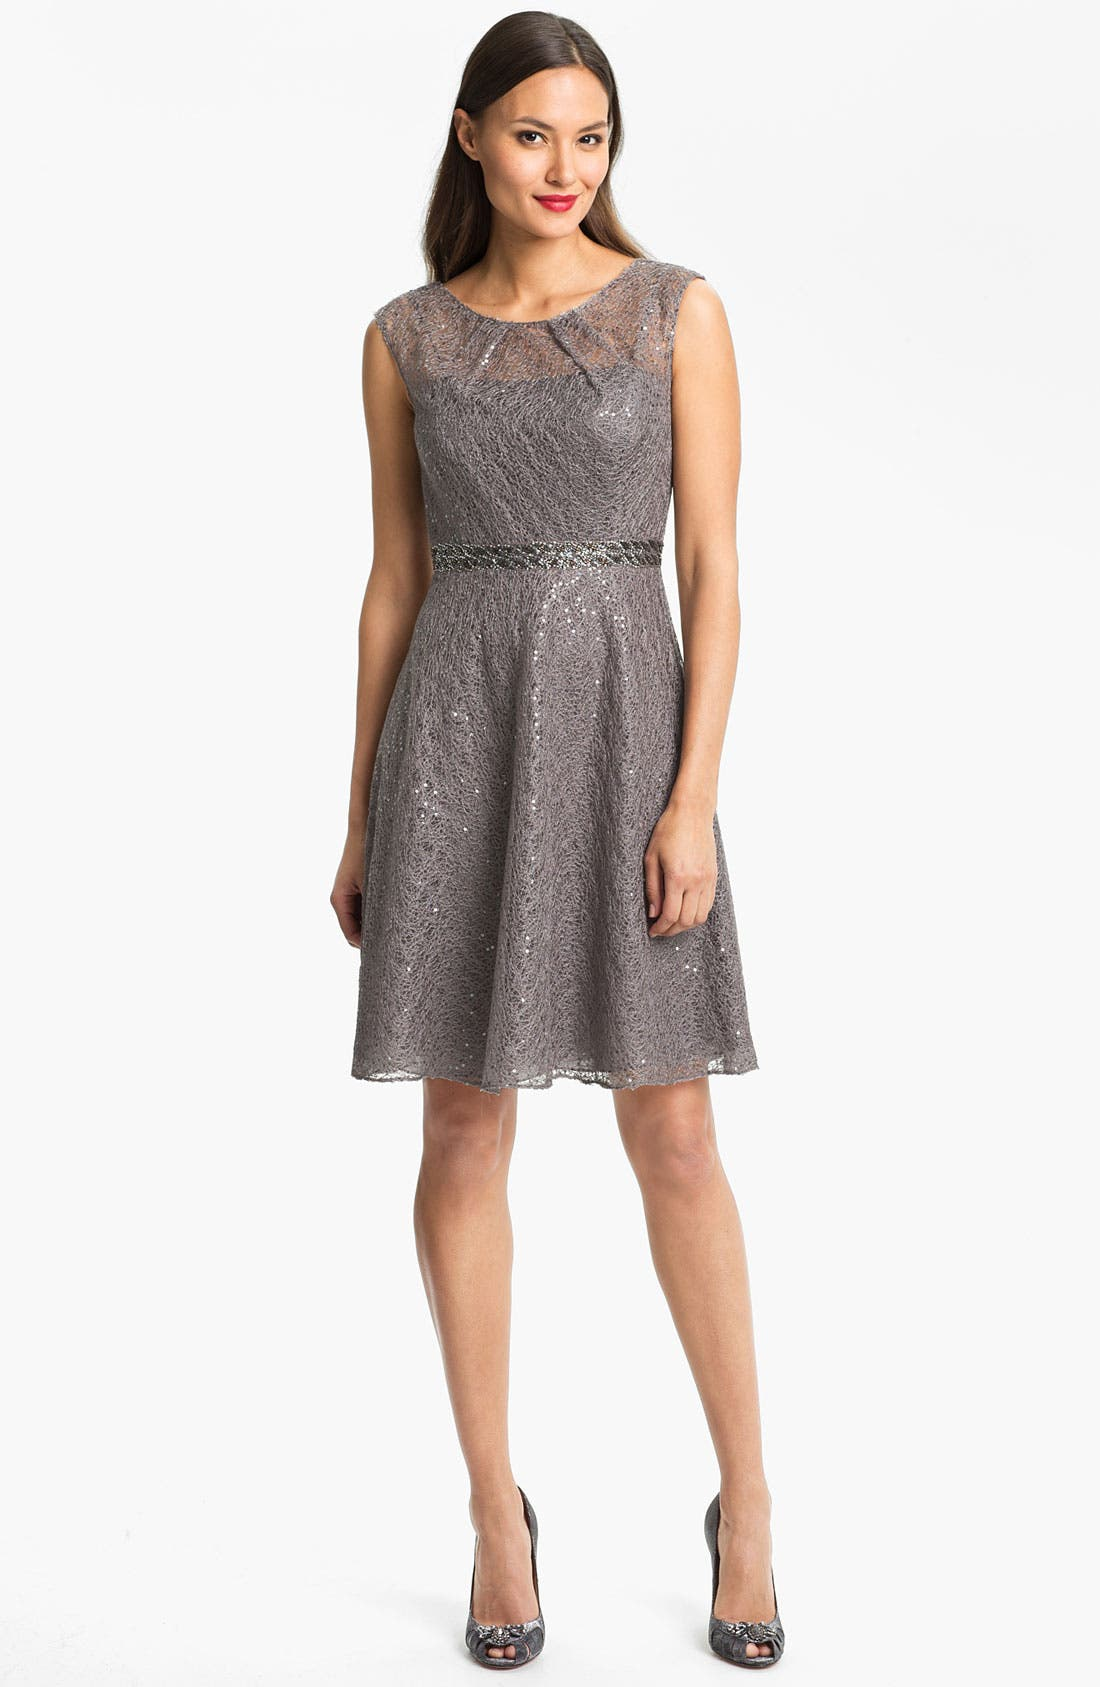 Main Image - Kay Unger Sequin Embellished Lace Dress